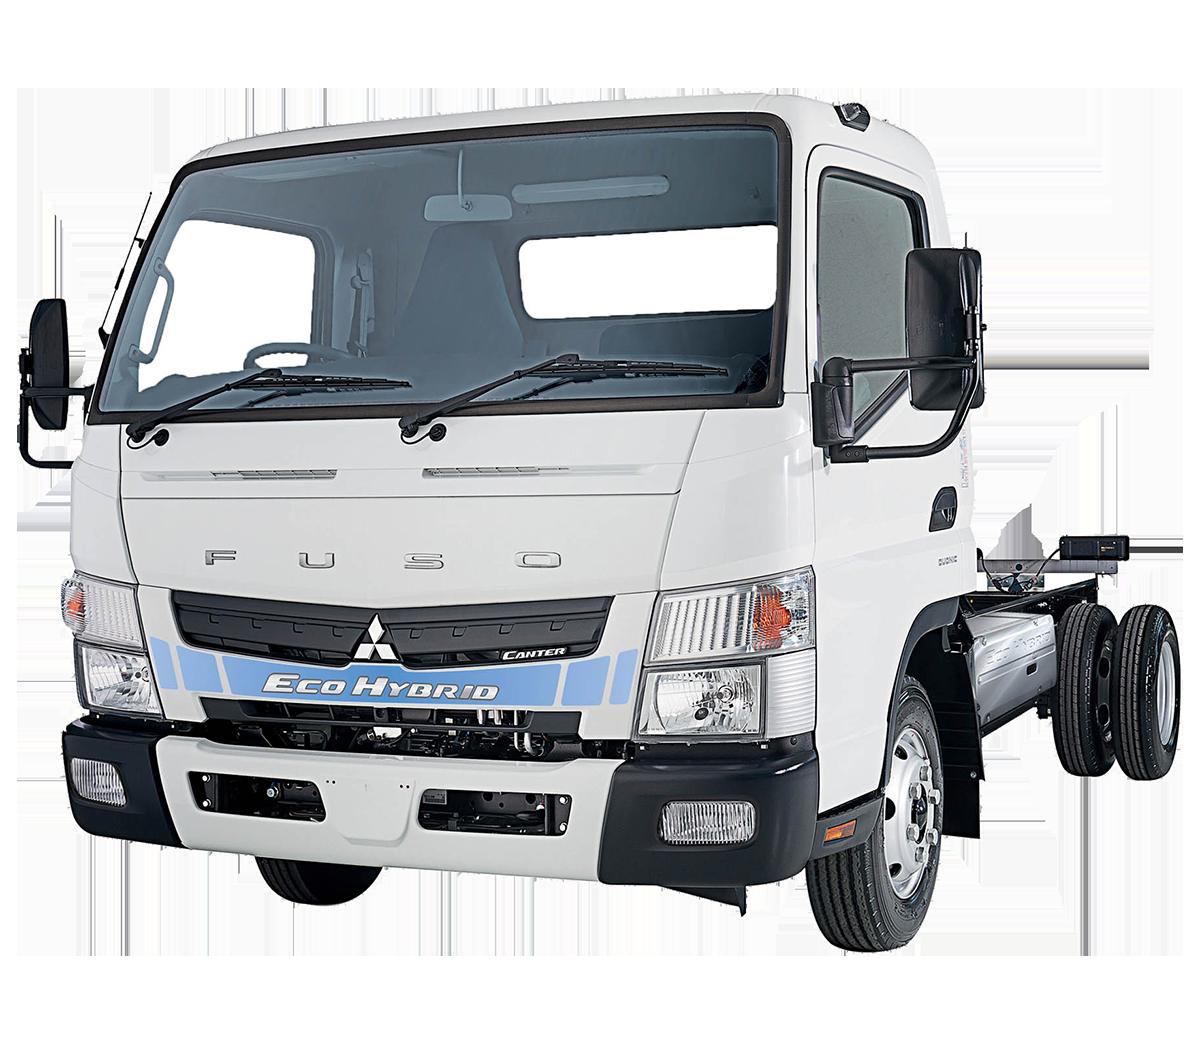 Fuso Canter Eco Hybrid Trucks - Hybrid Light Trucks | Fuso ...